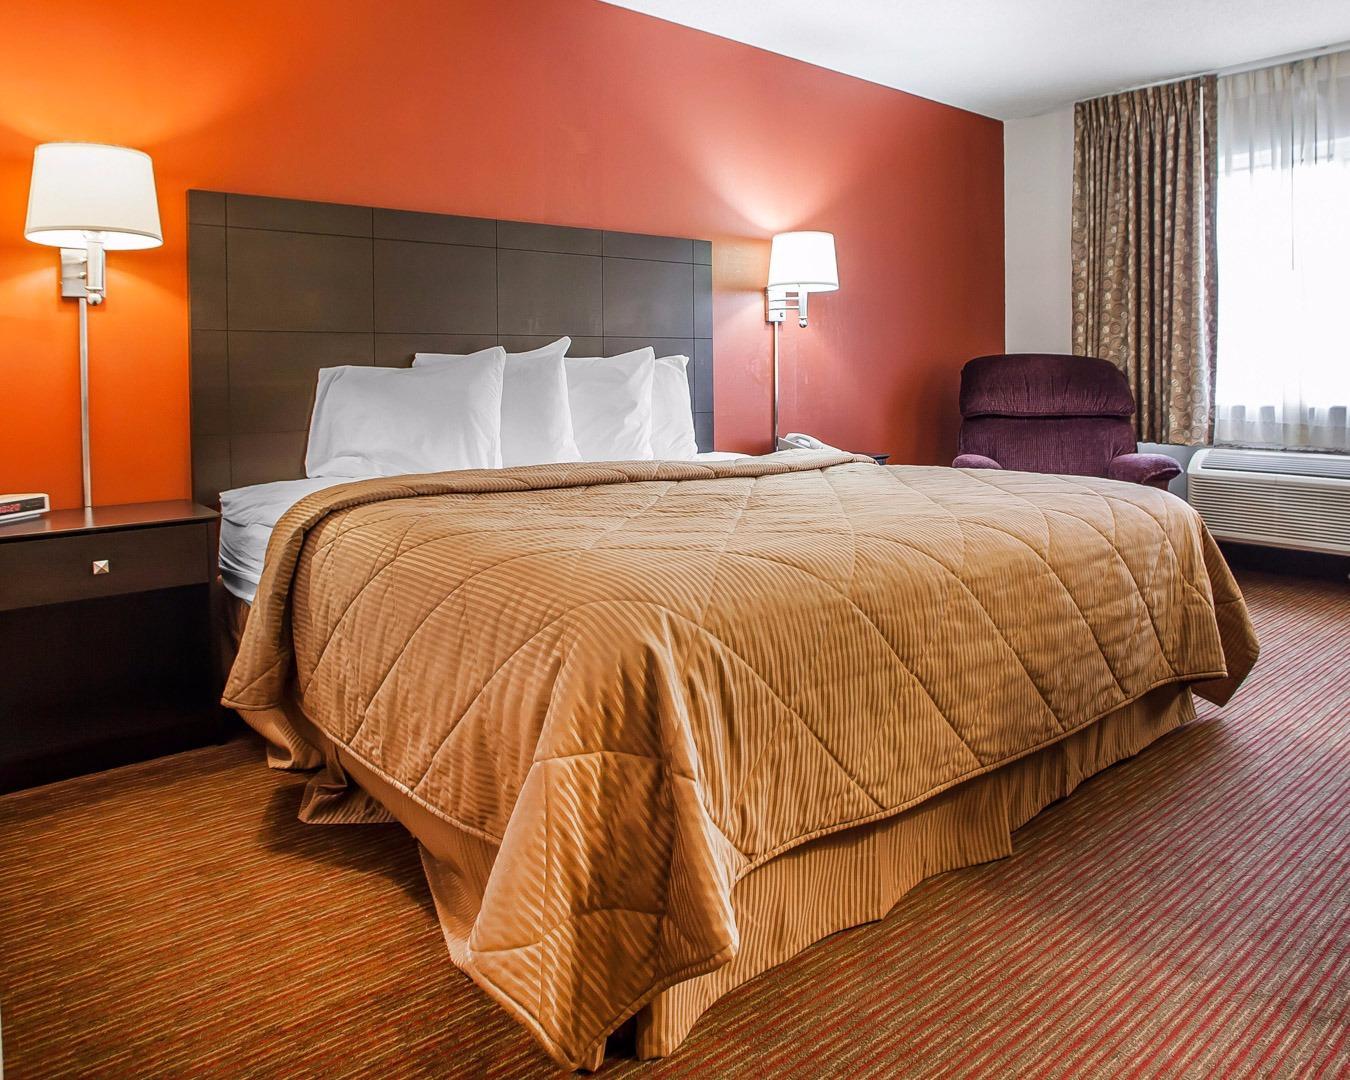 Quality Inn & Suites, Mason City IA